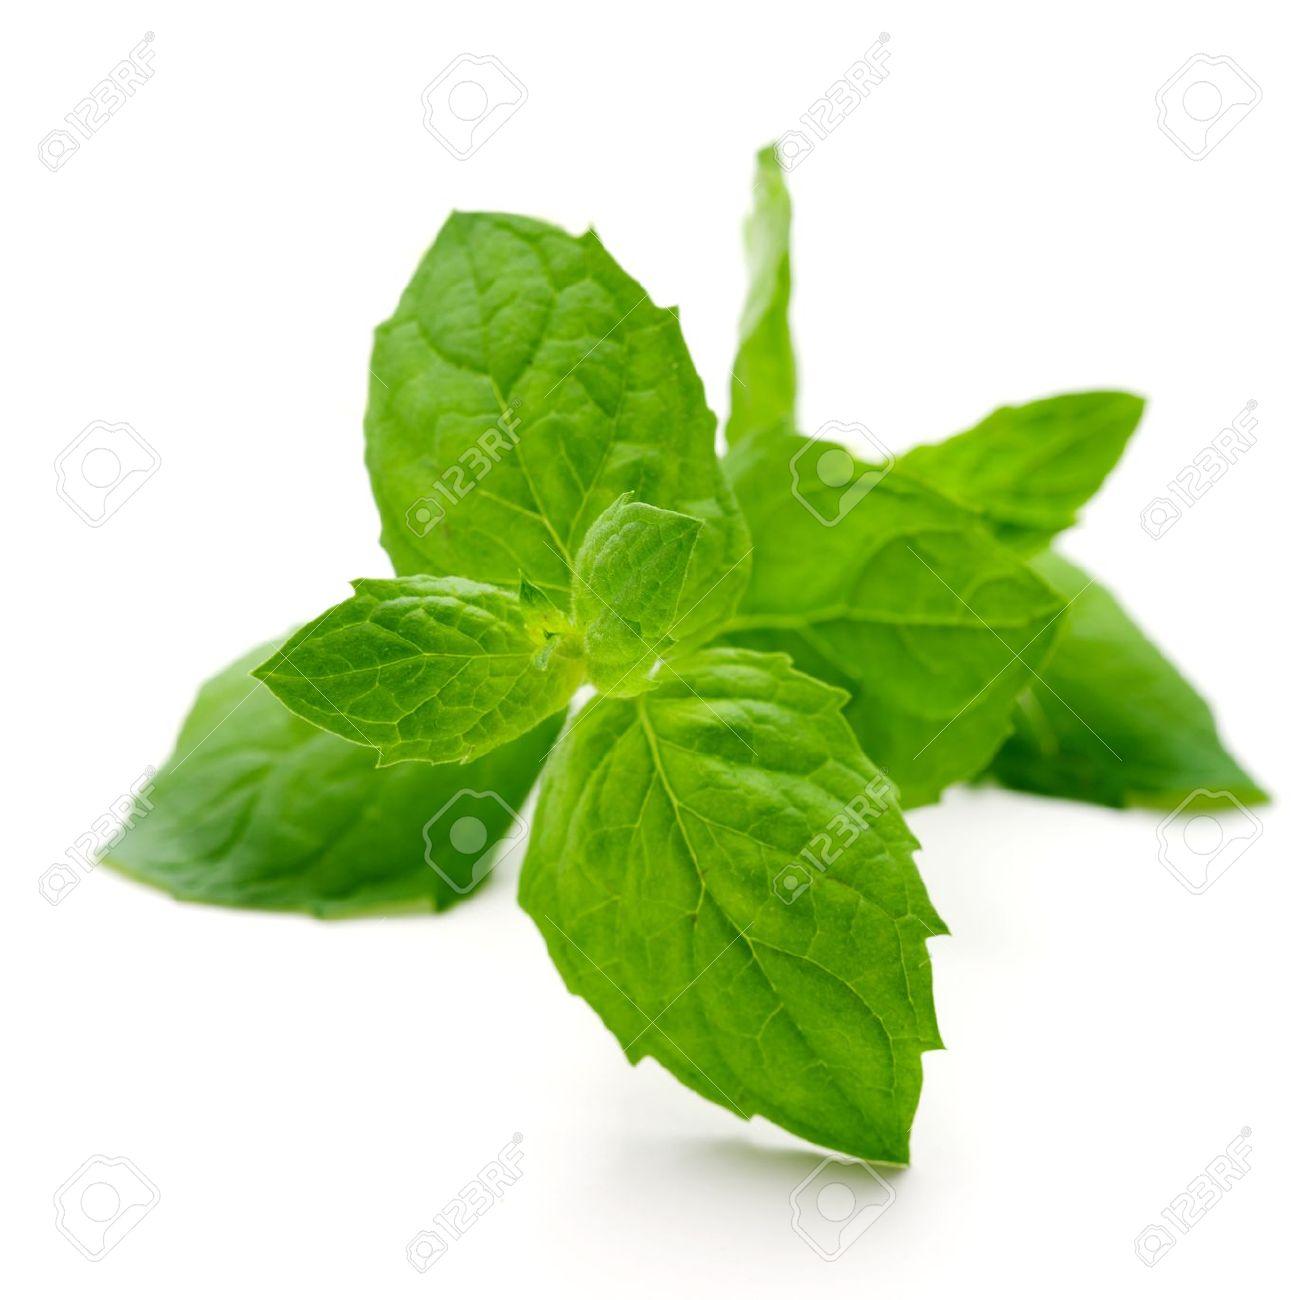 Fresh mint leaves on white isolated background Stock Photo - 15034627